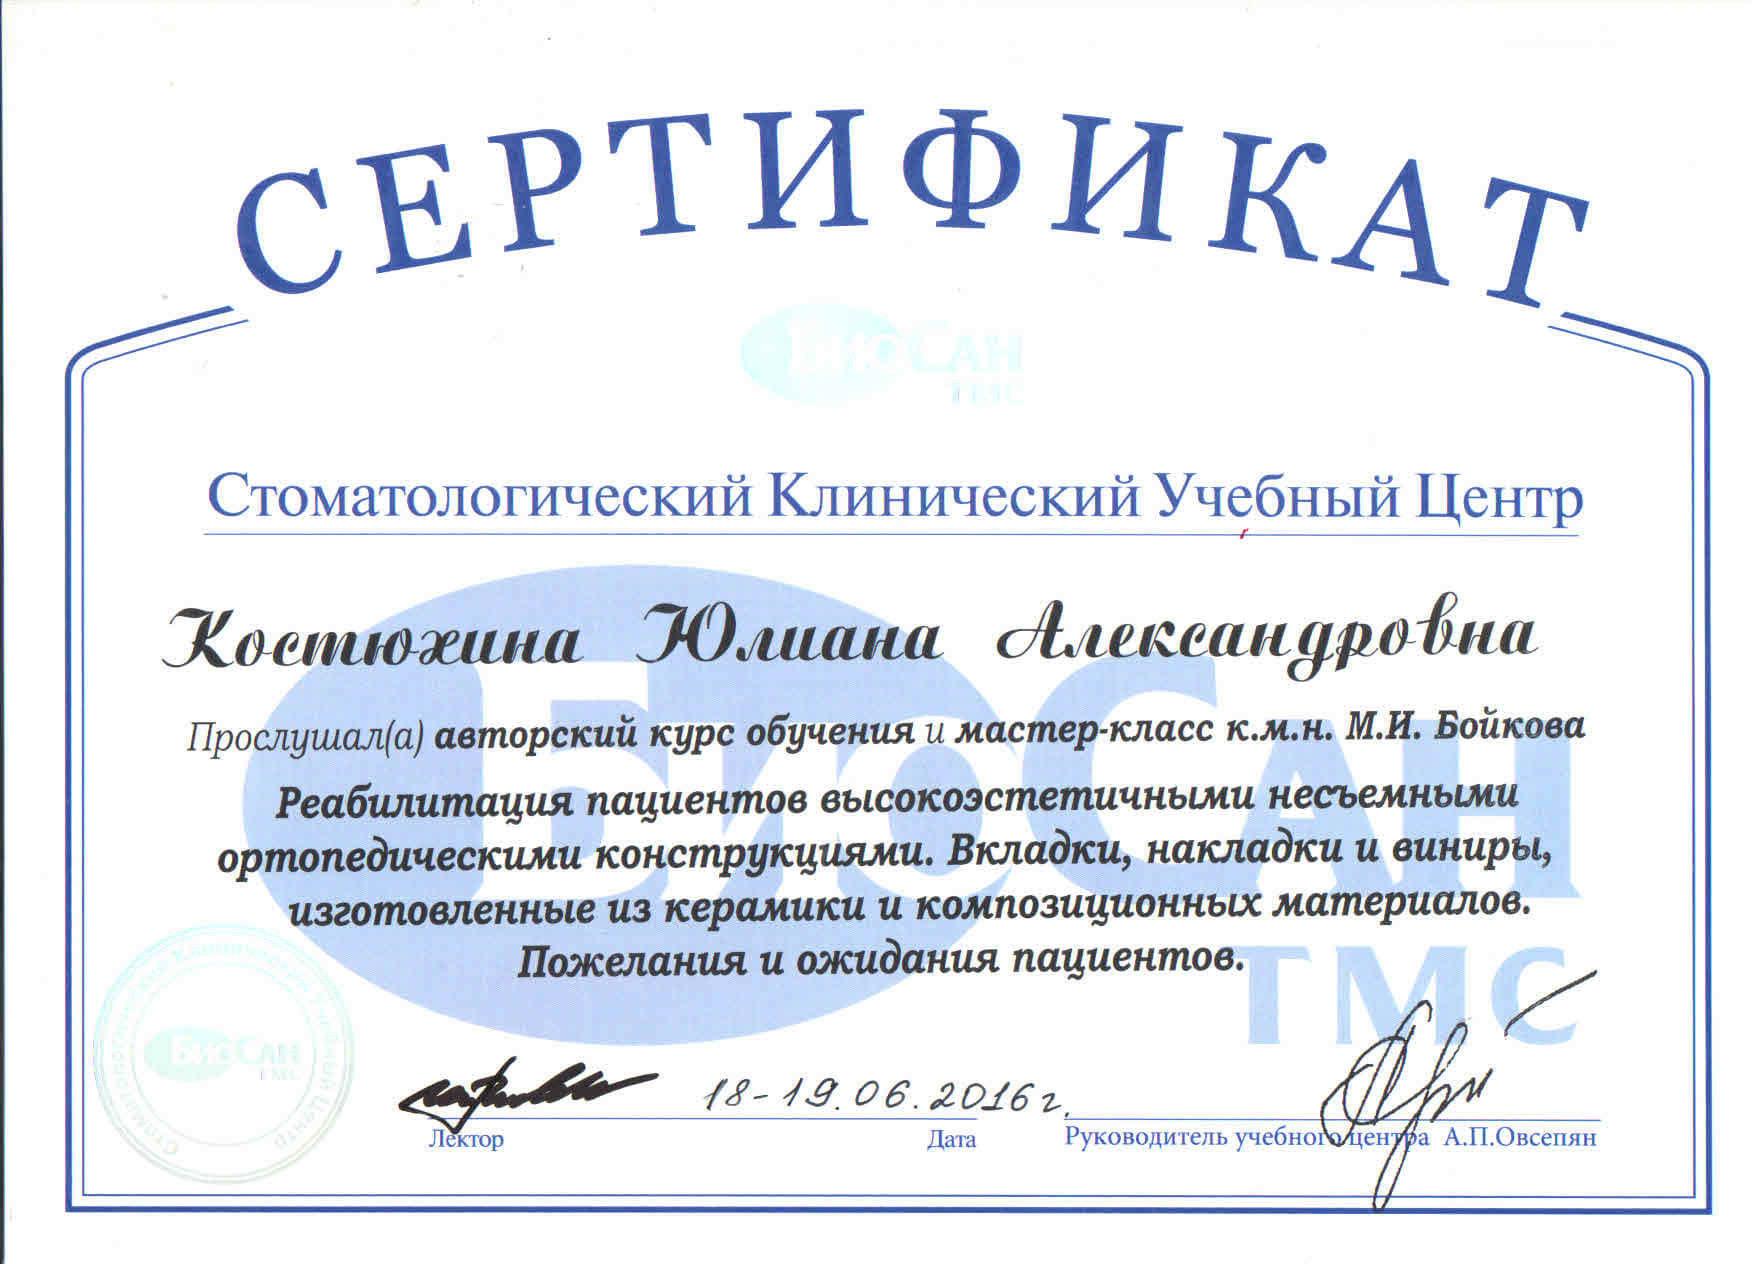 Костюхина Ю.А.8